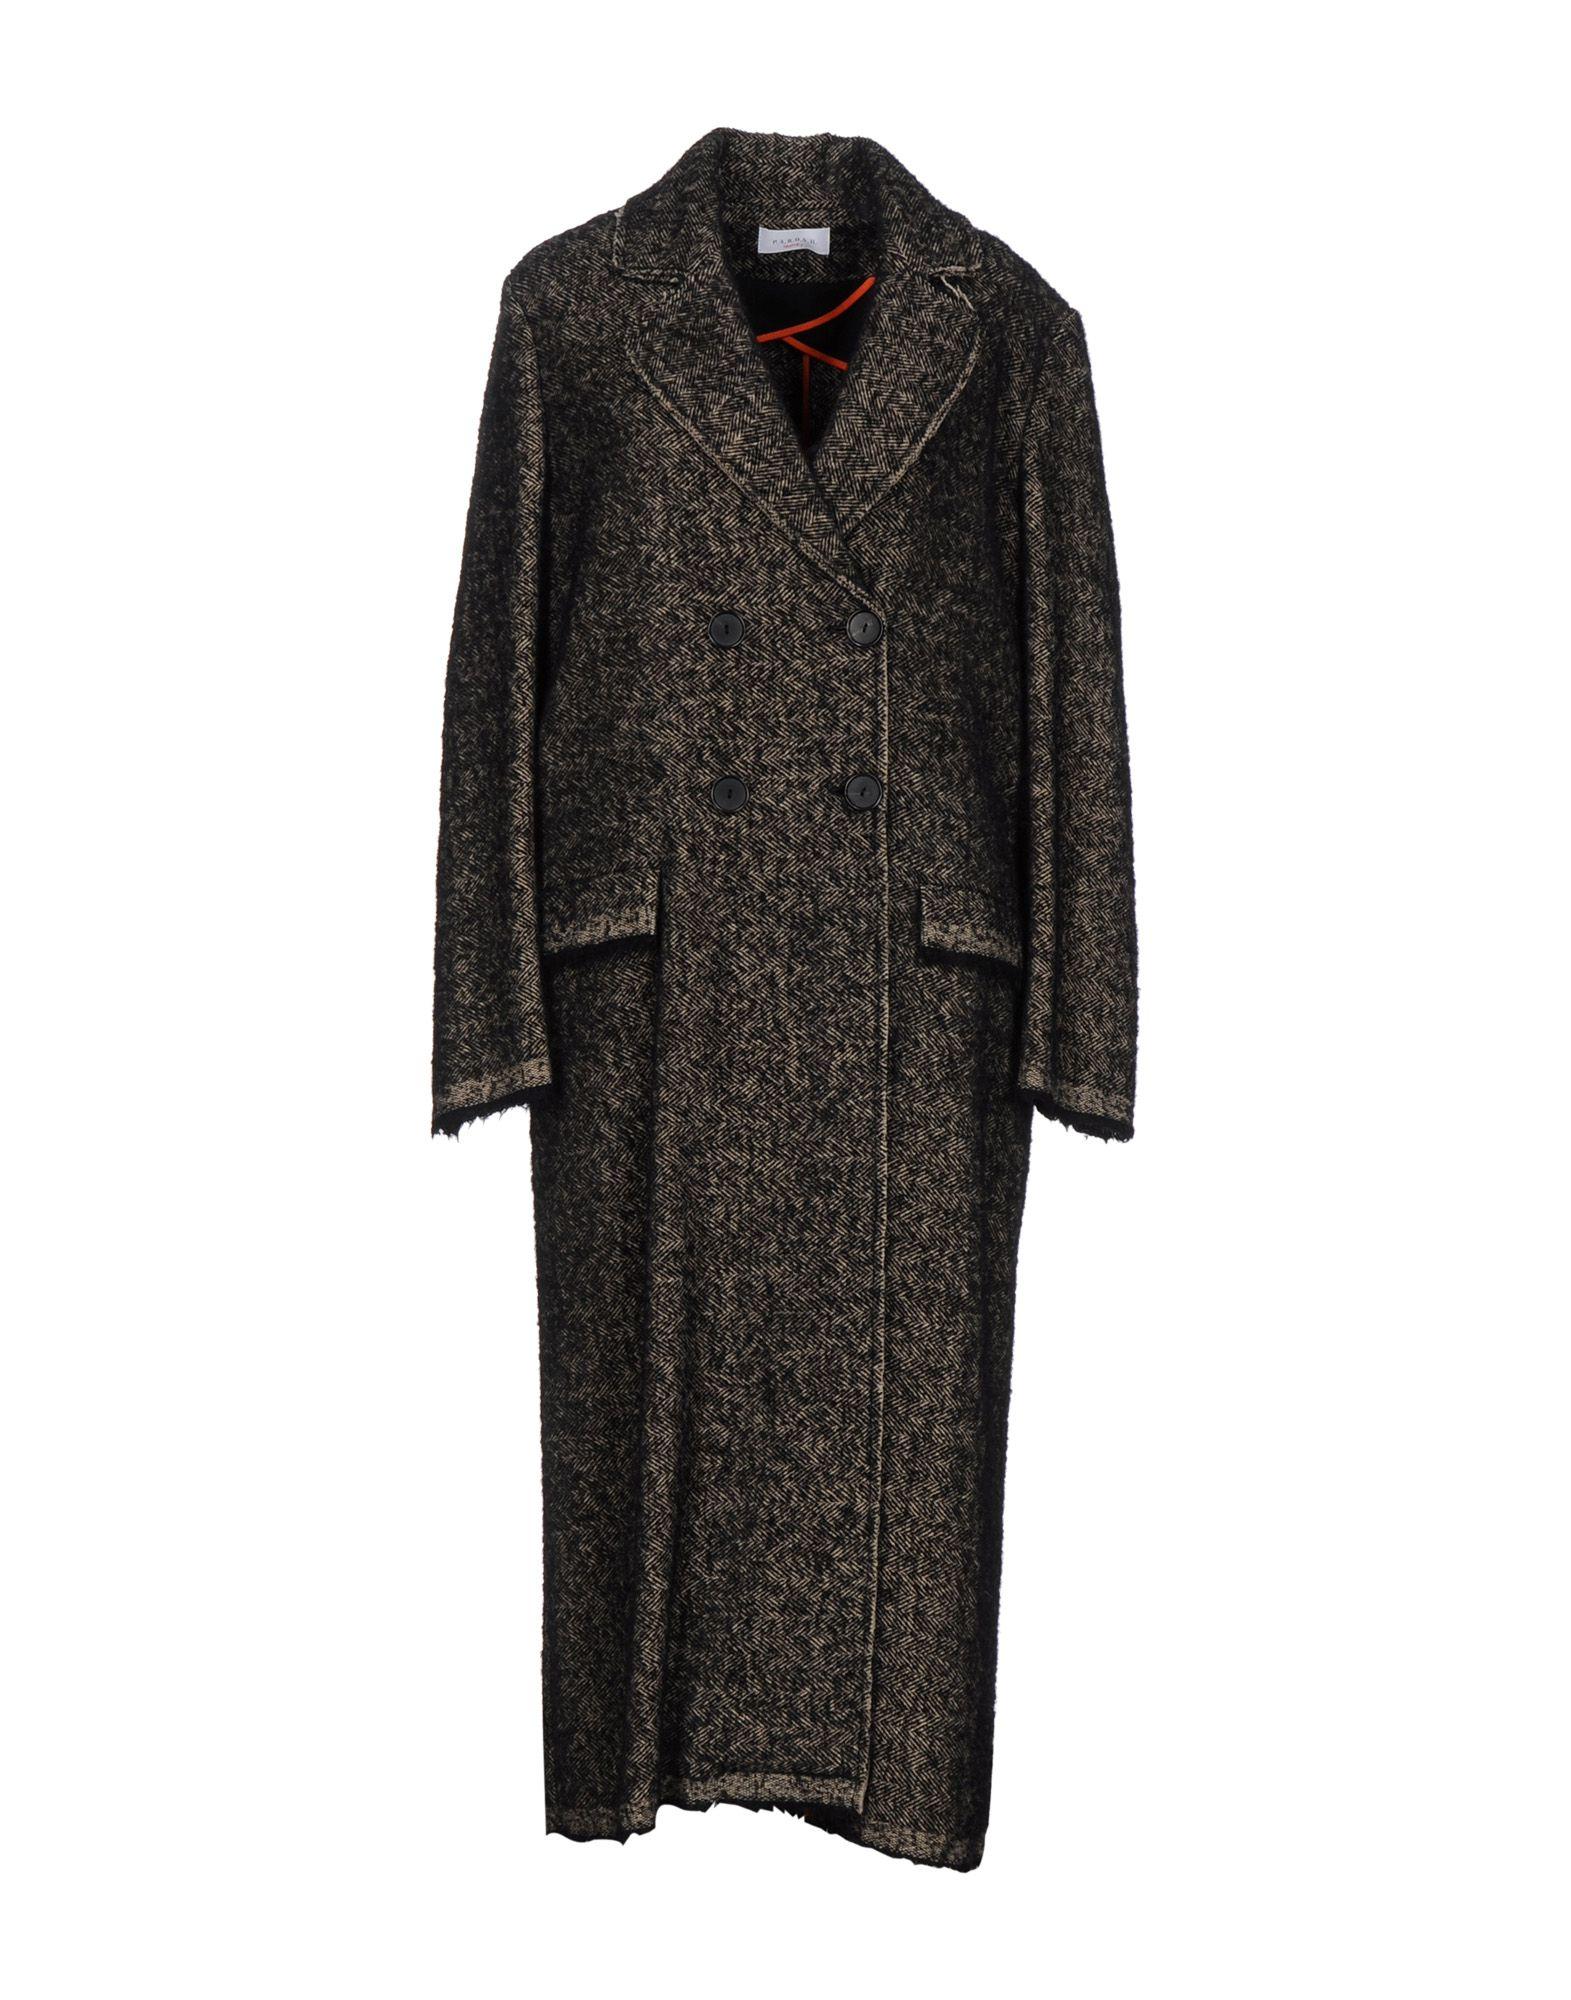 P.A.R.O.S.H. Damen Mantel Farbe Schwarz Größe 5 - broschei